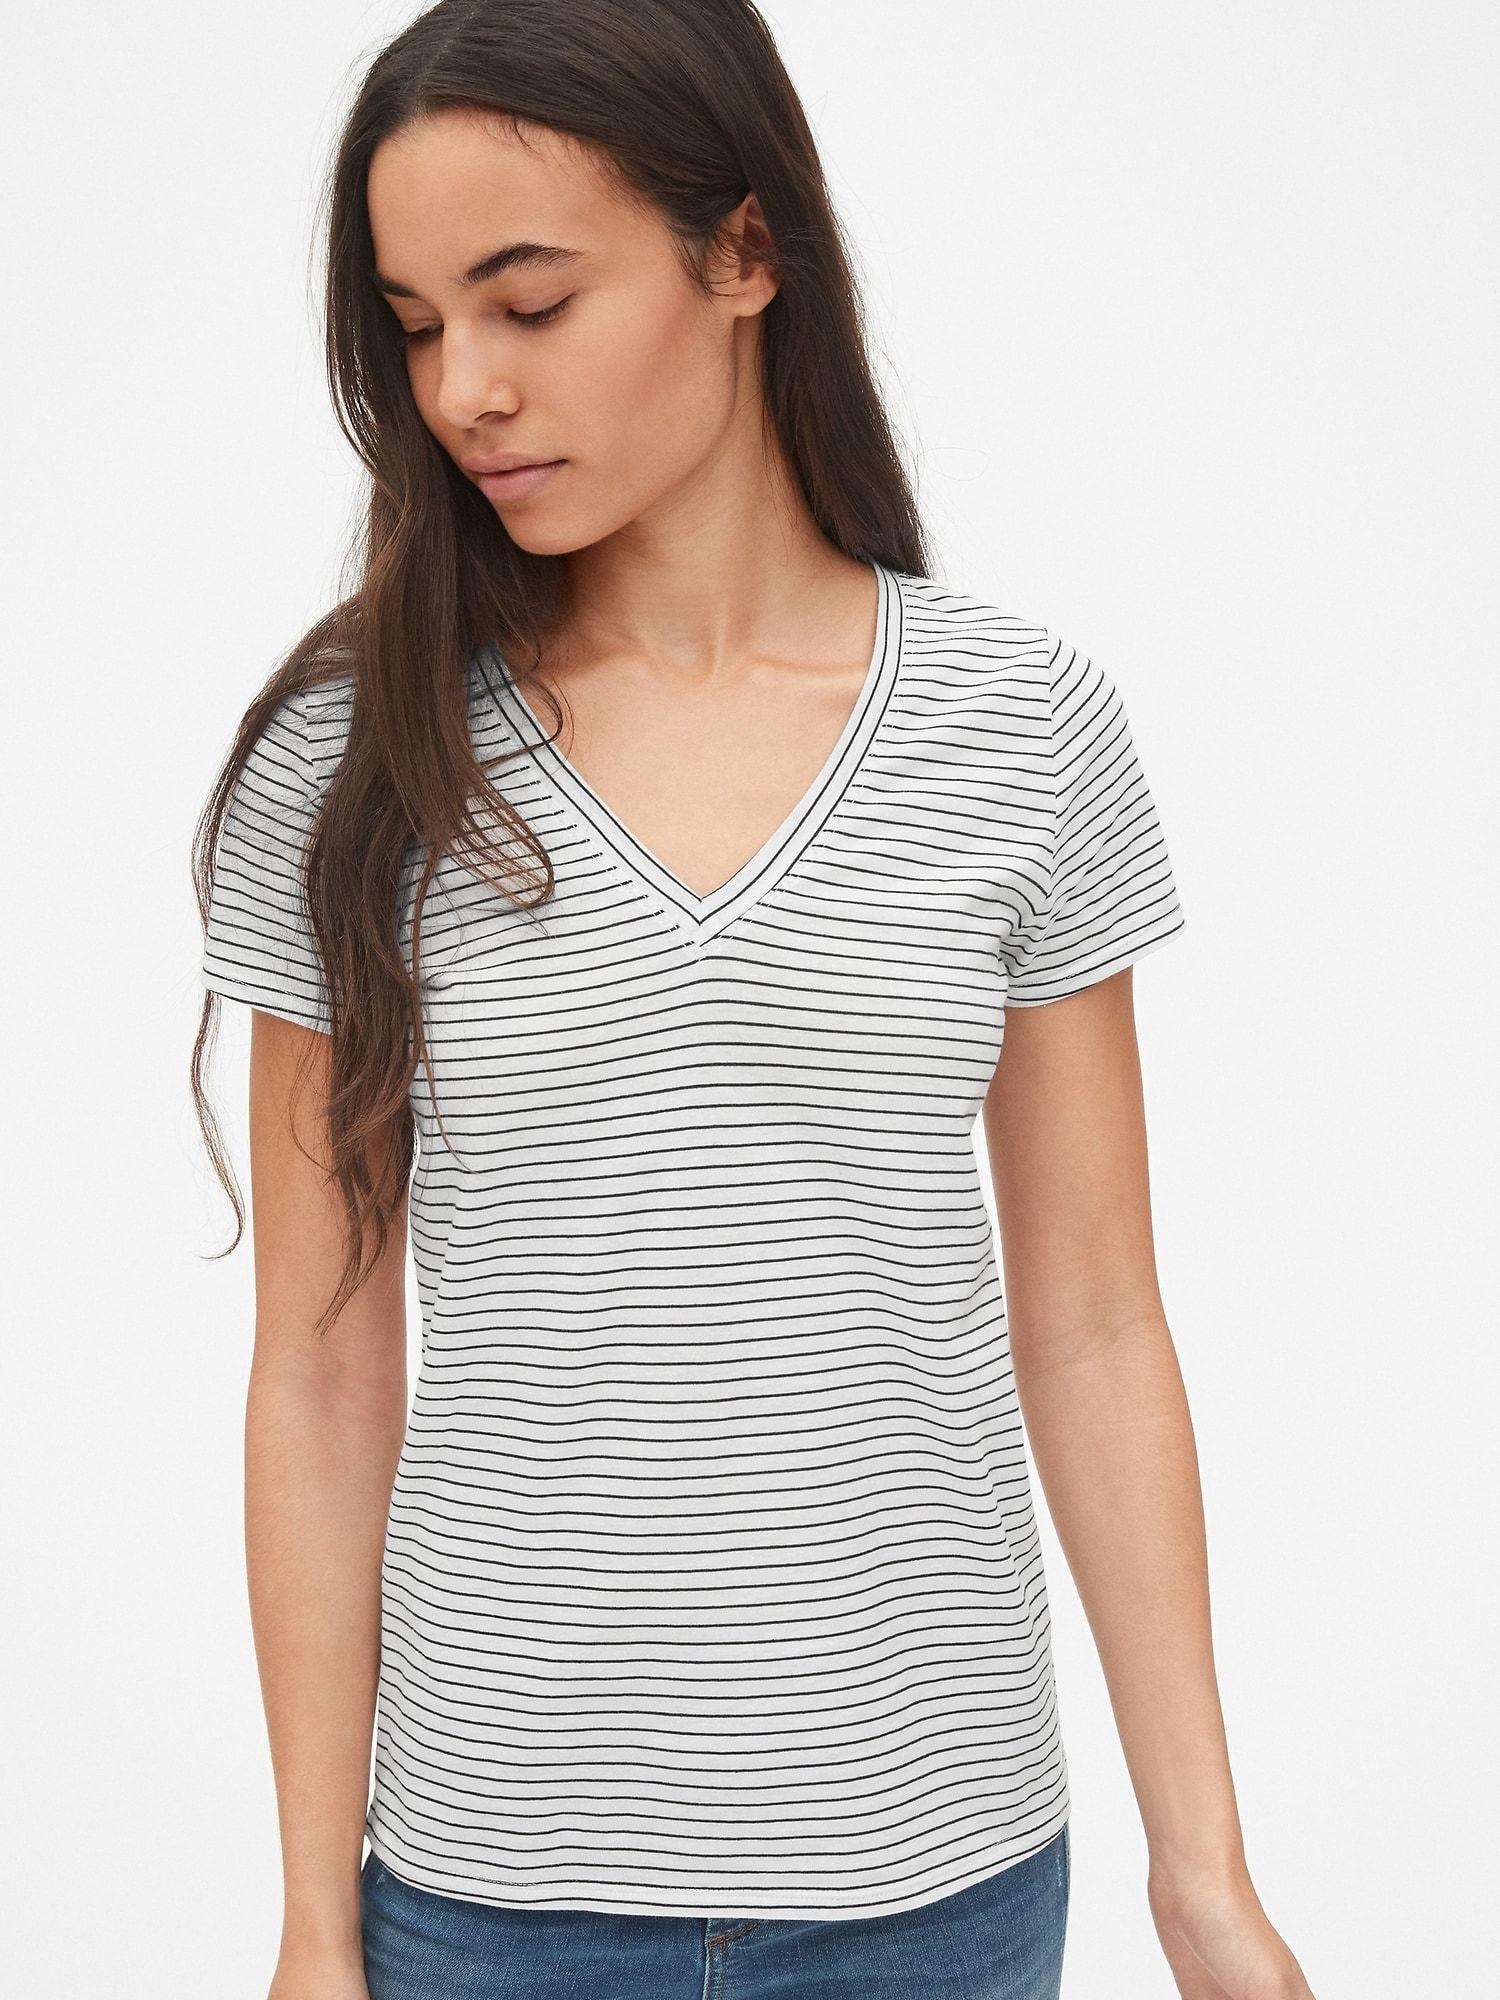 Gap womens vintage wash stripe vneck tshirt black